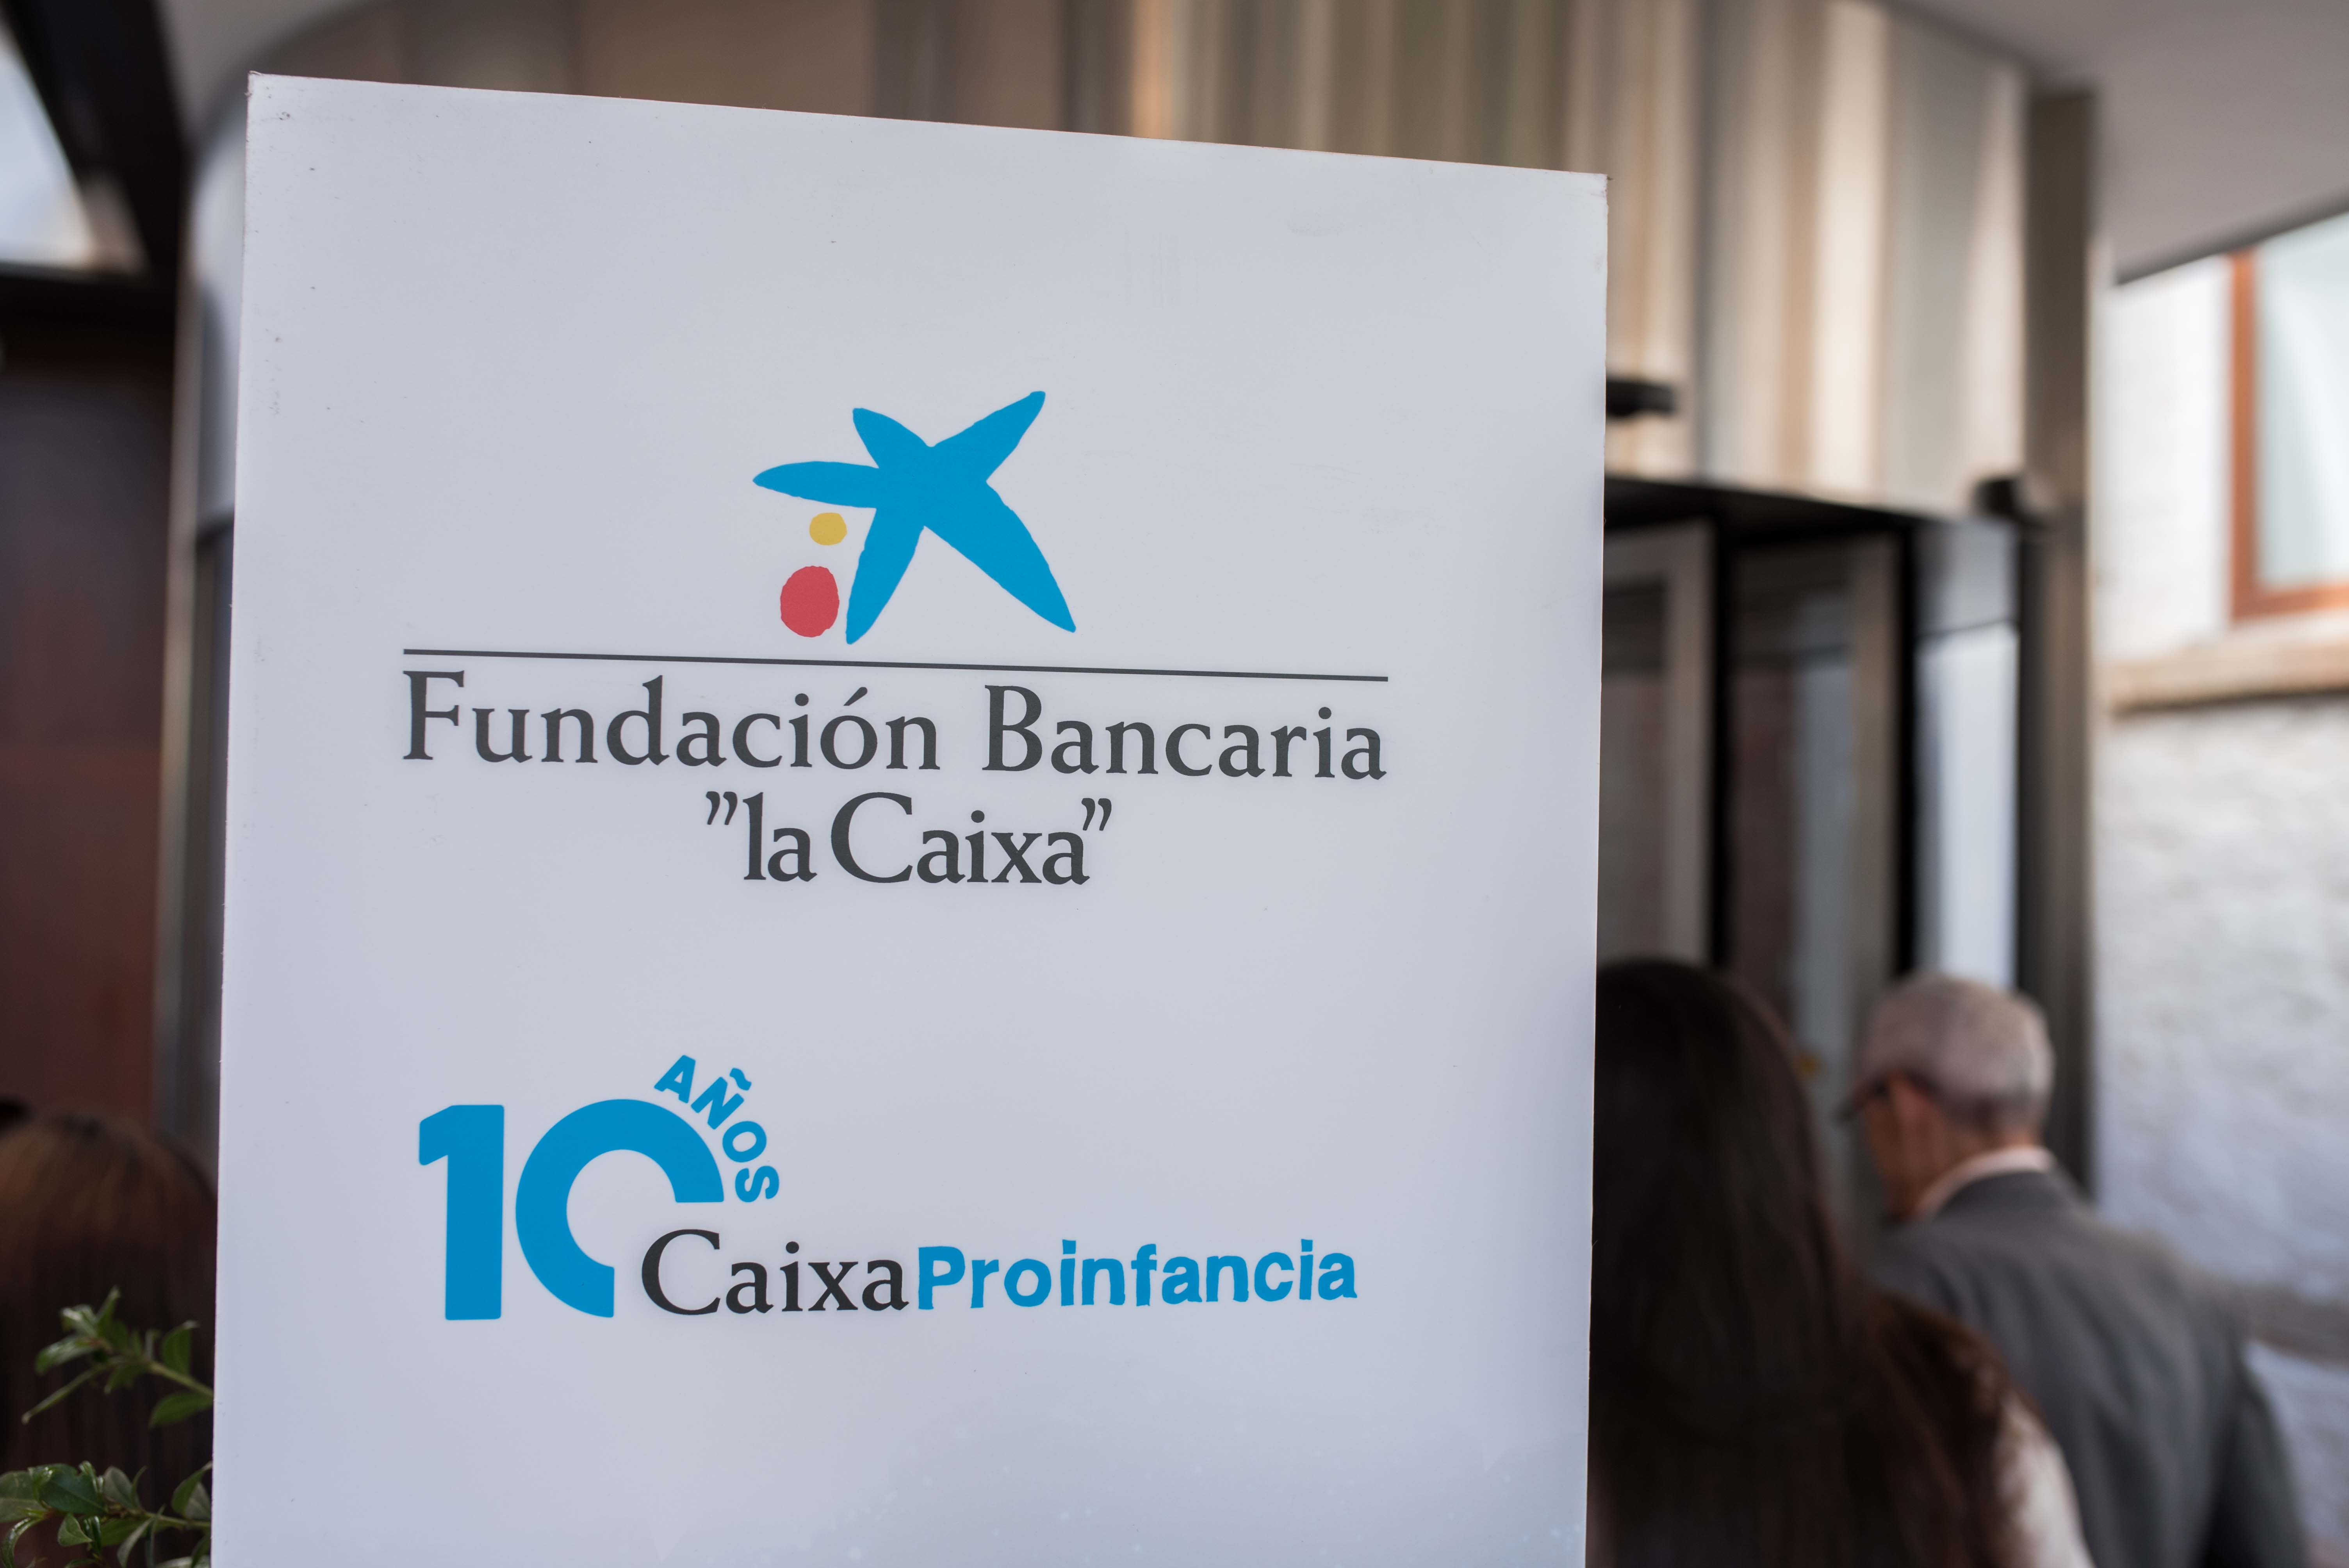 CAIXA_PROINFANCIA-19